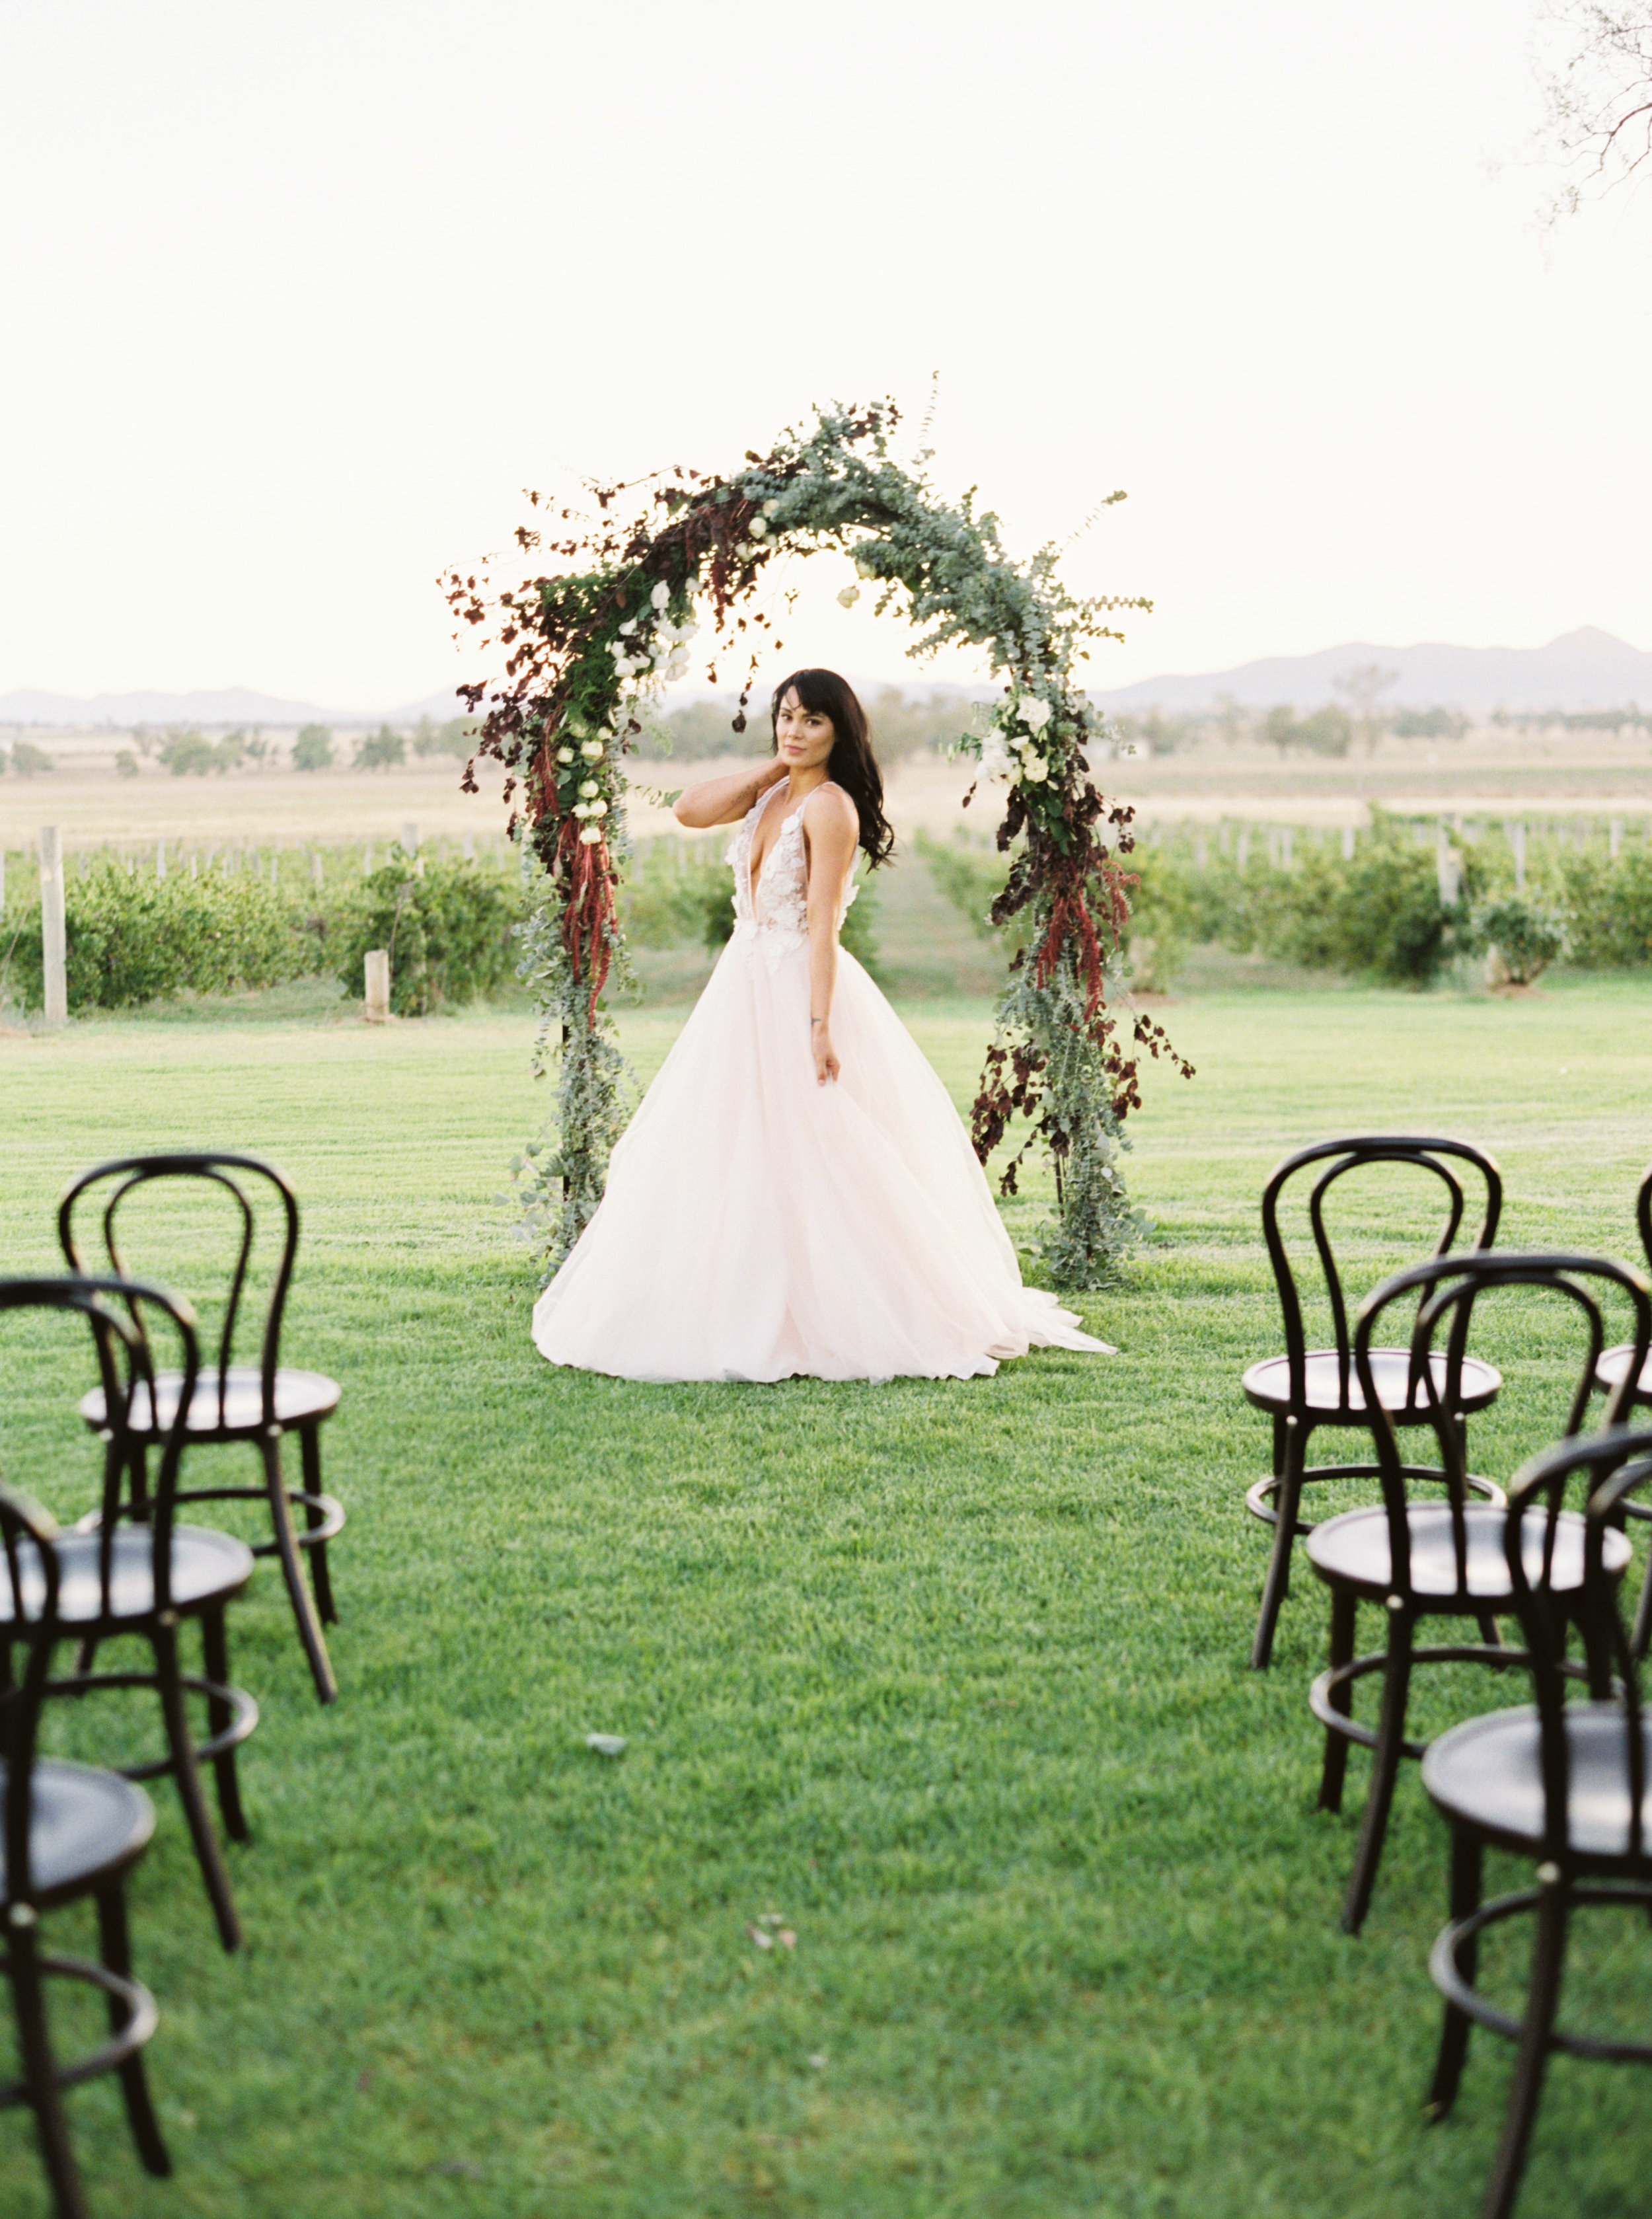 00016- Tamworth NSW Wedding Photographer Sheri McMahon-2.jpg